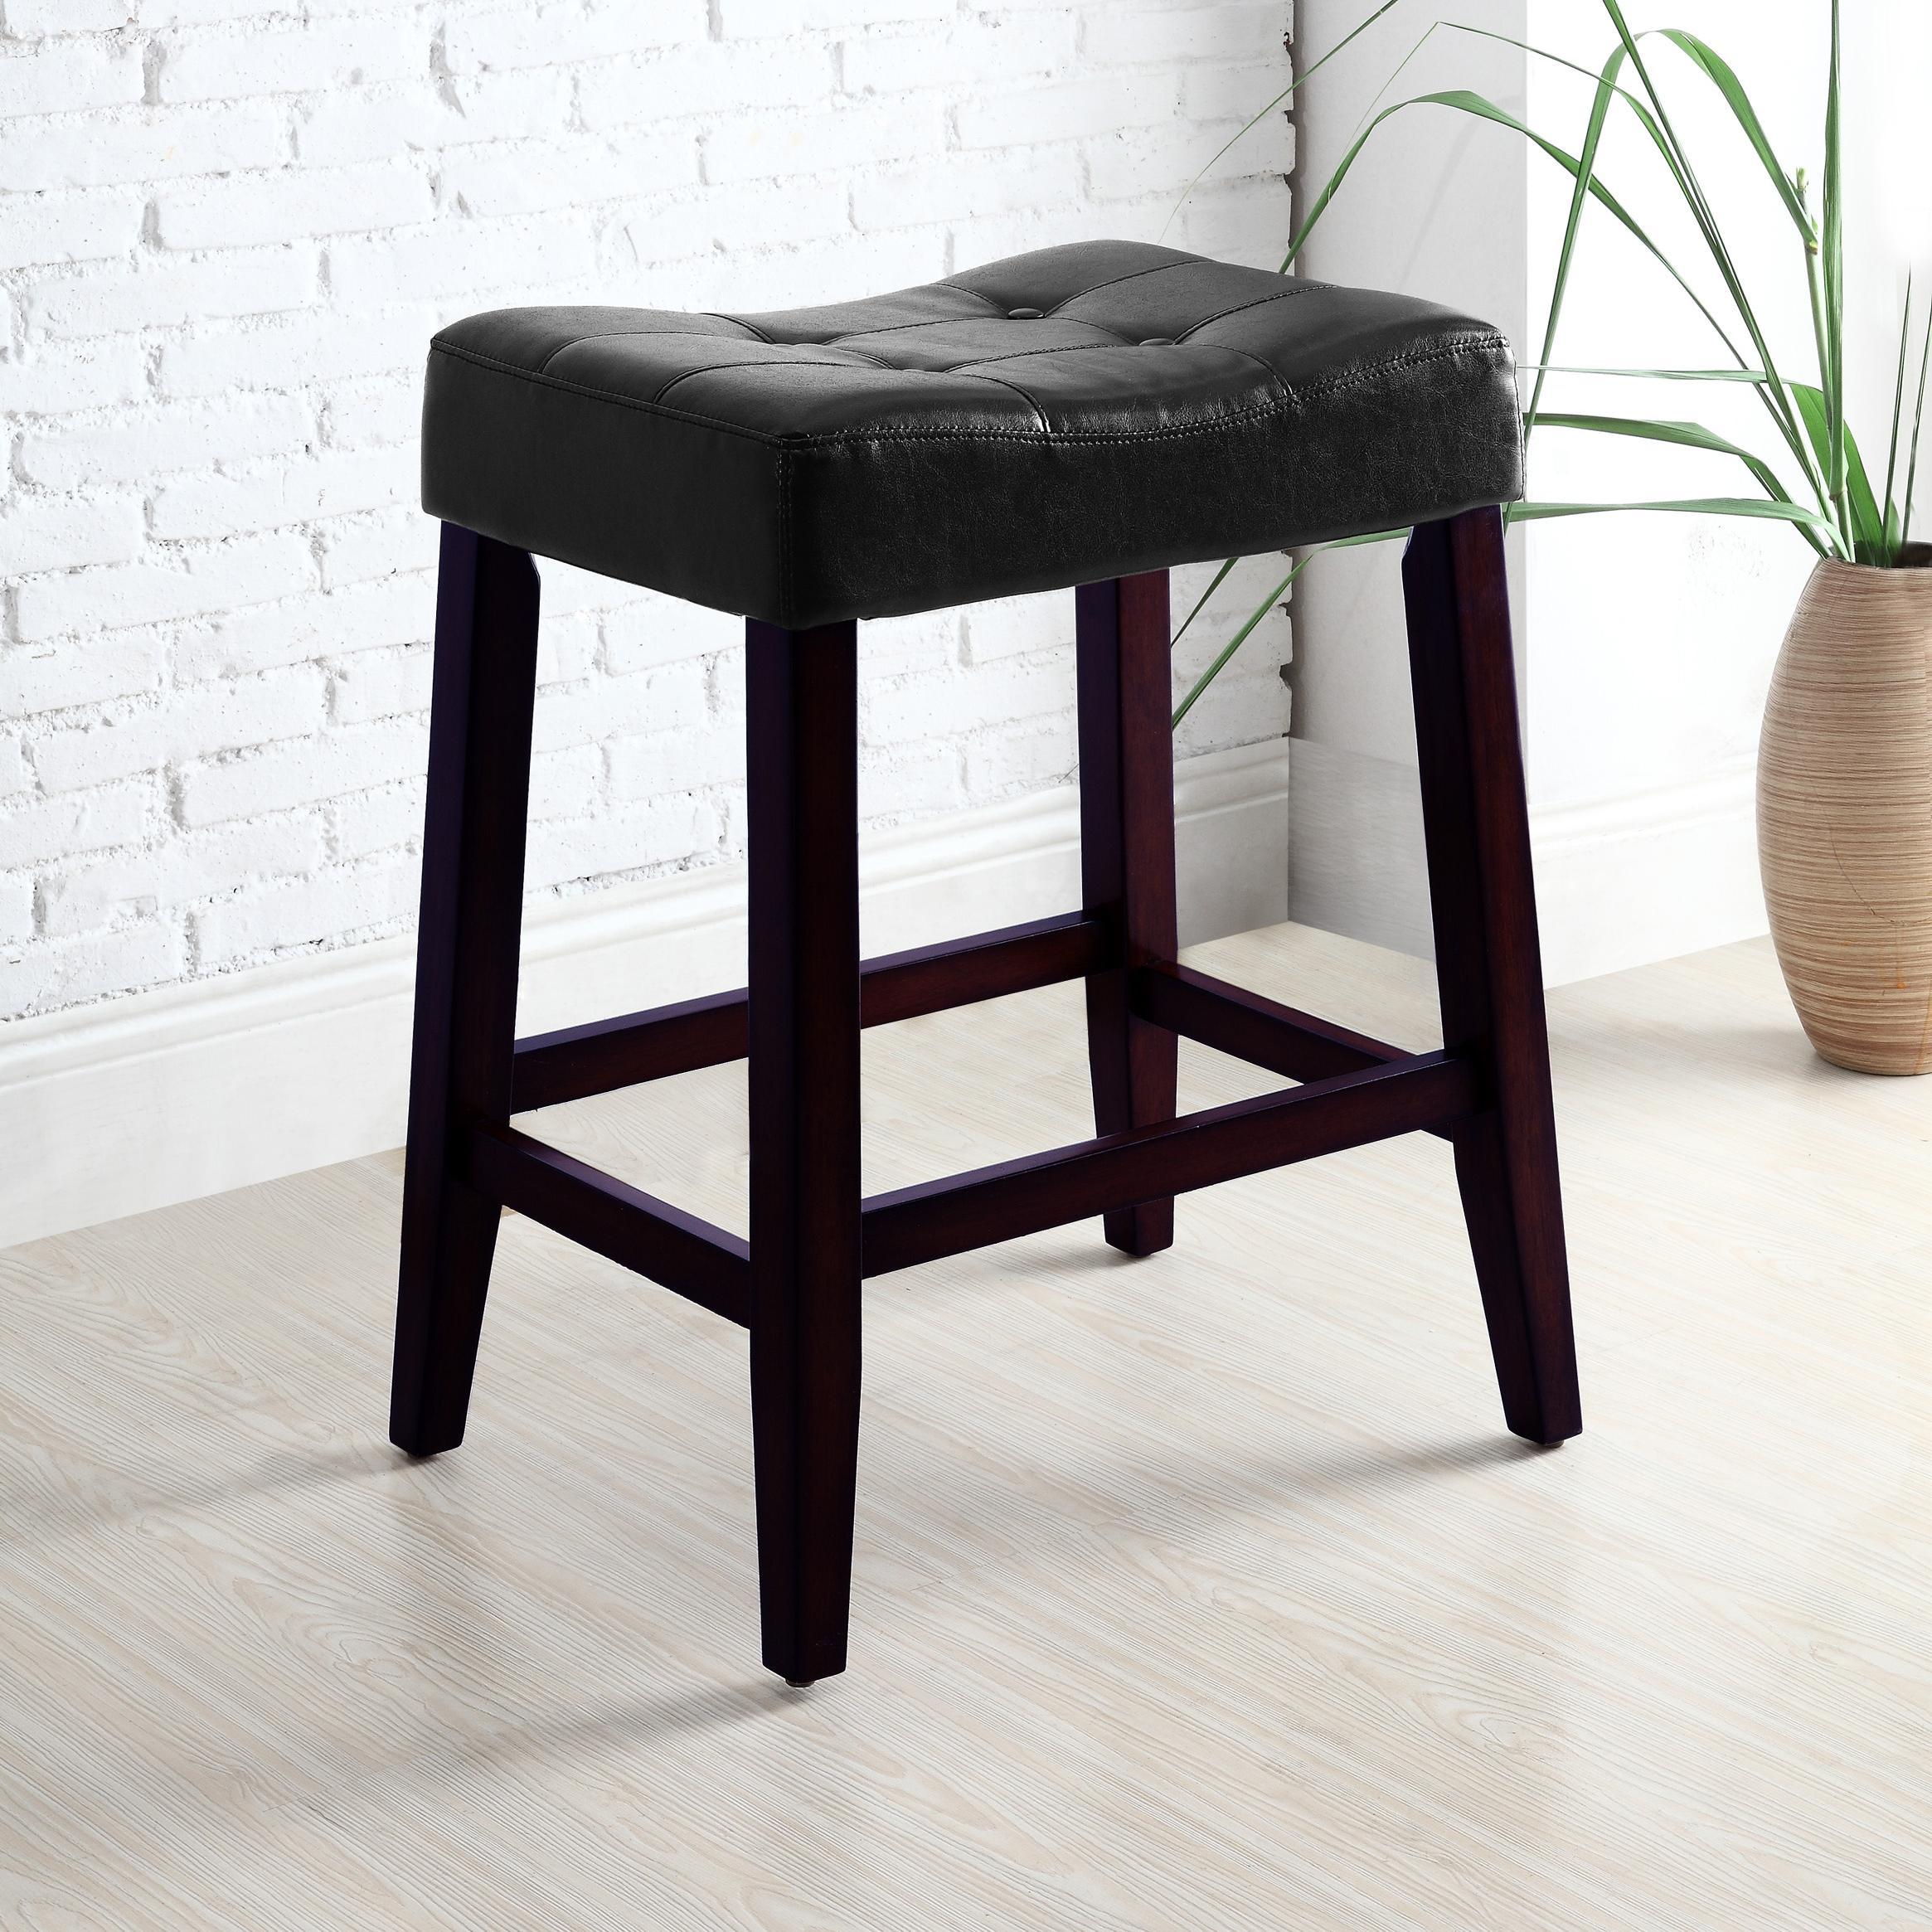 "Crown Mark Kent & Portman Saddle Chairs 24"" Kent Saddle Chair - Item Number: 2787C-24-BK"